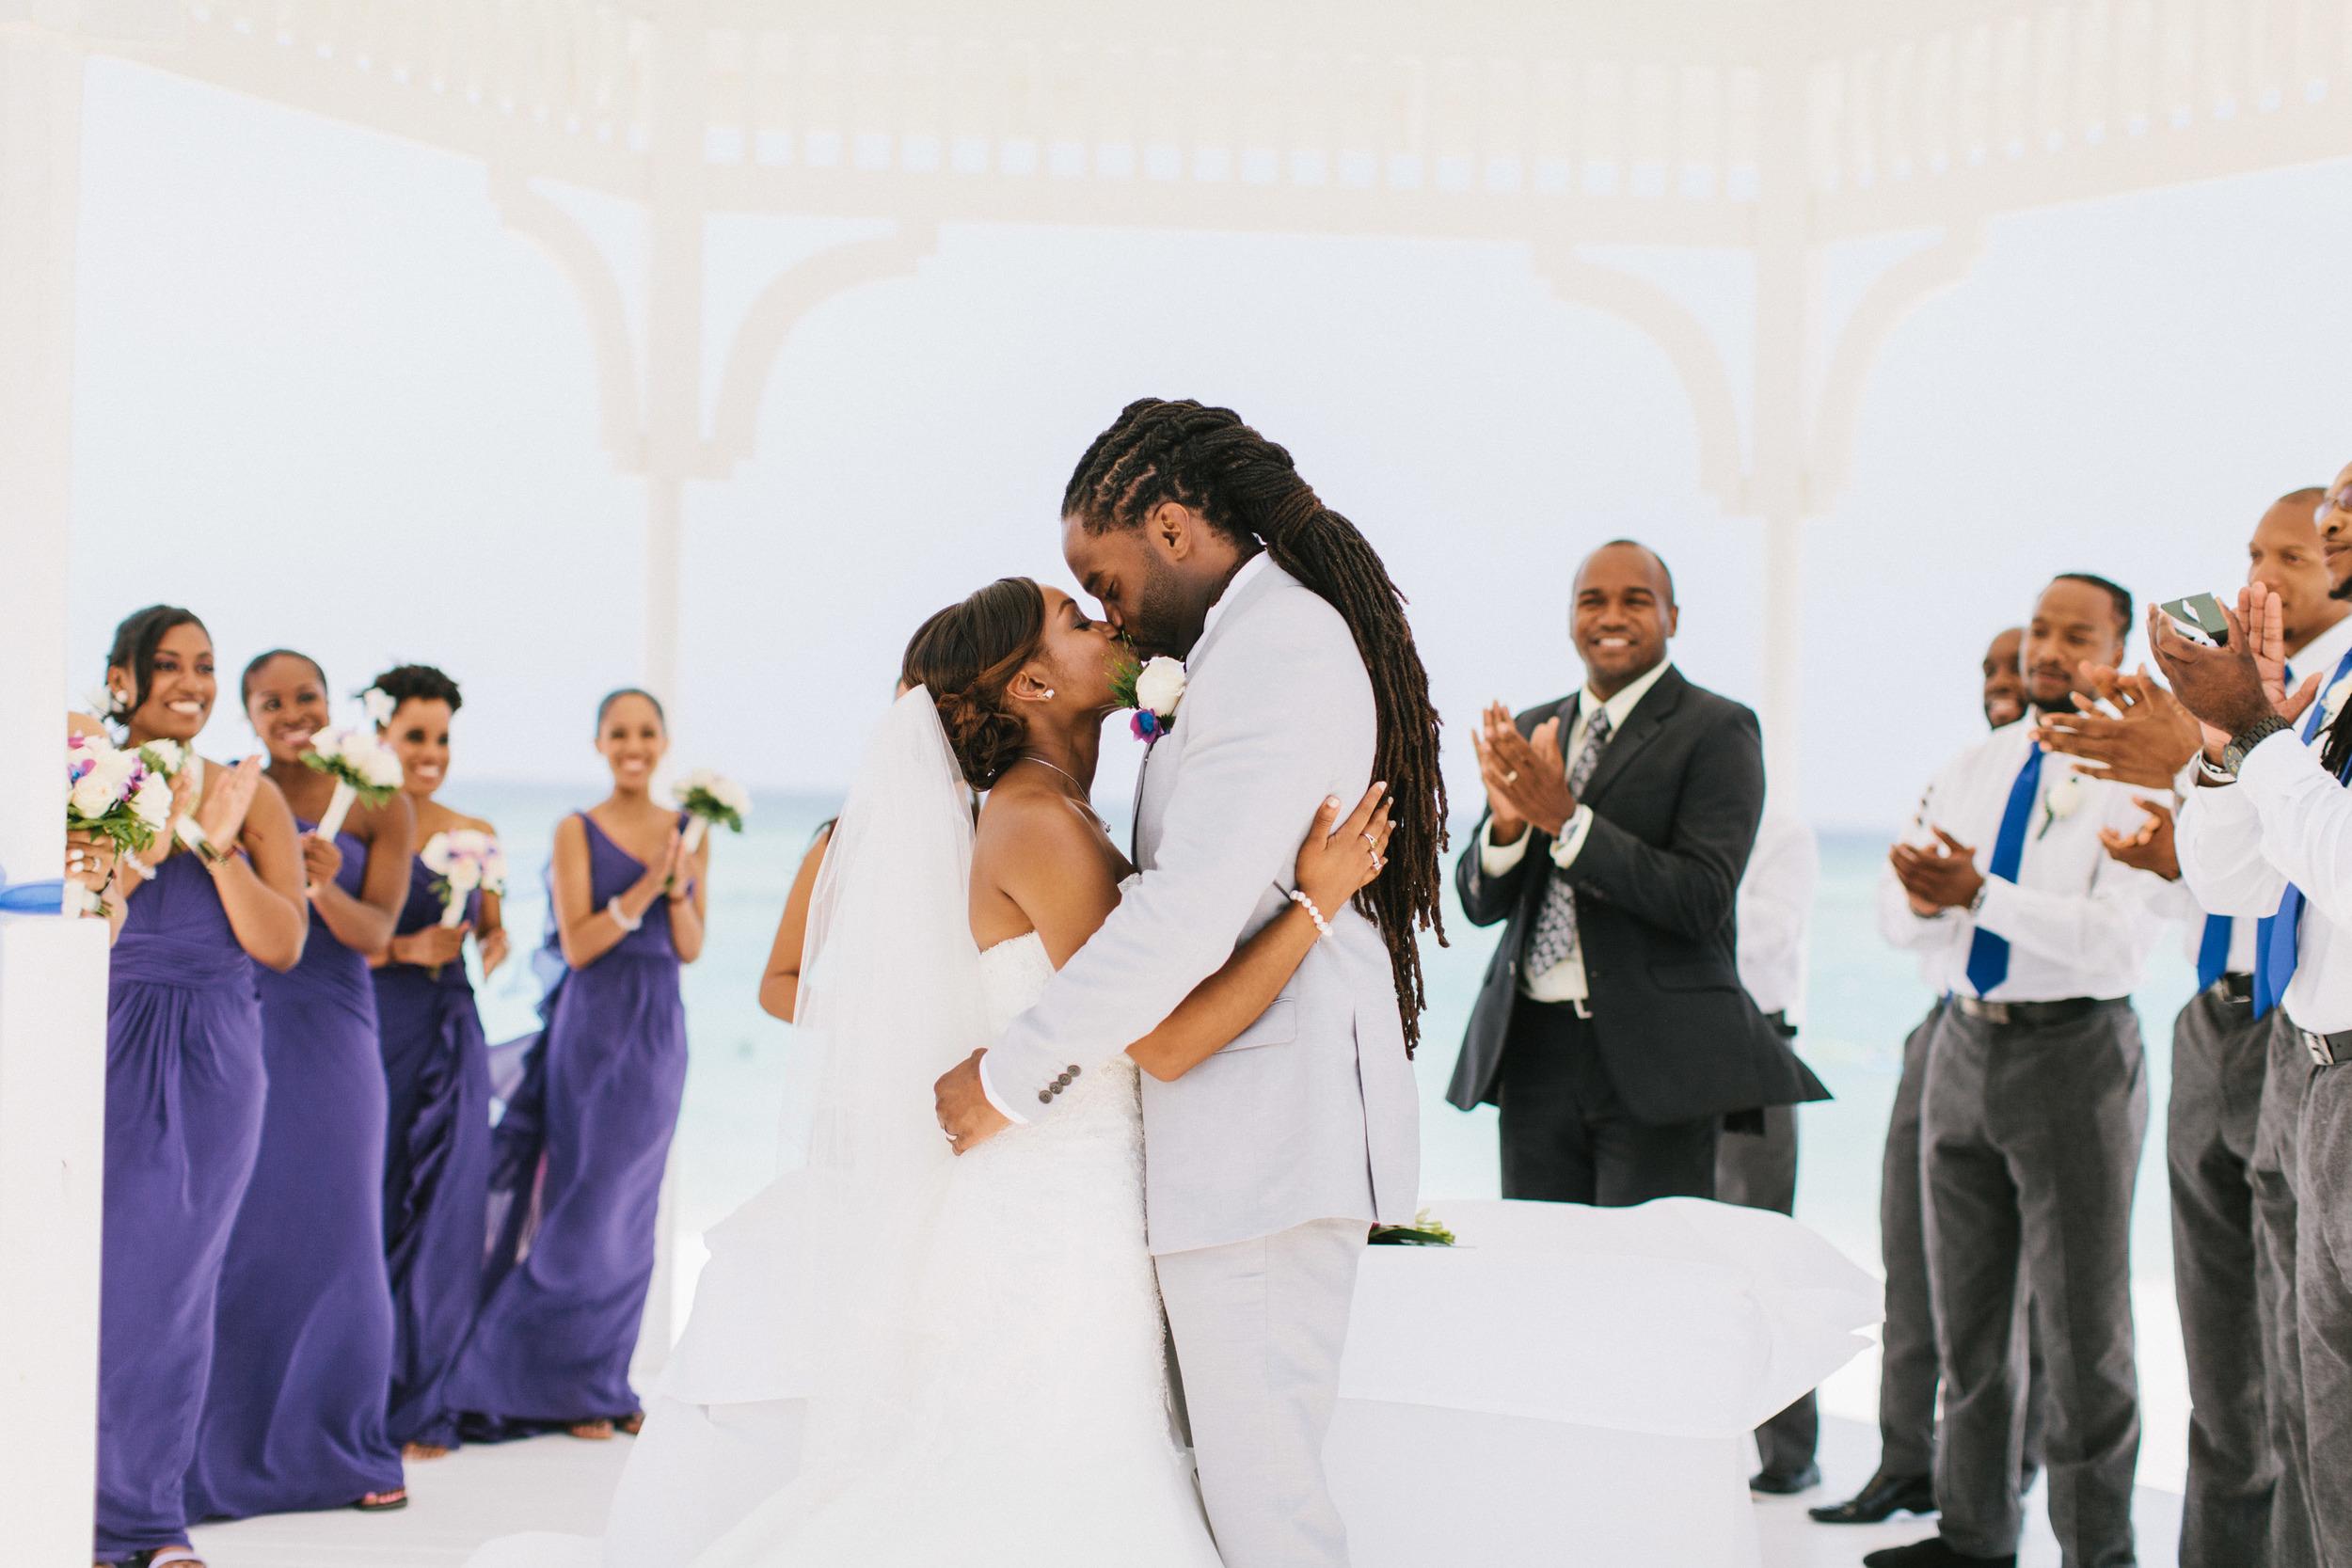 michael-rousseau-photography-dominican-republic-destination-wedding-cara-jason-colonial-majestic-dominican-republic080.jpg